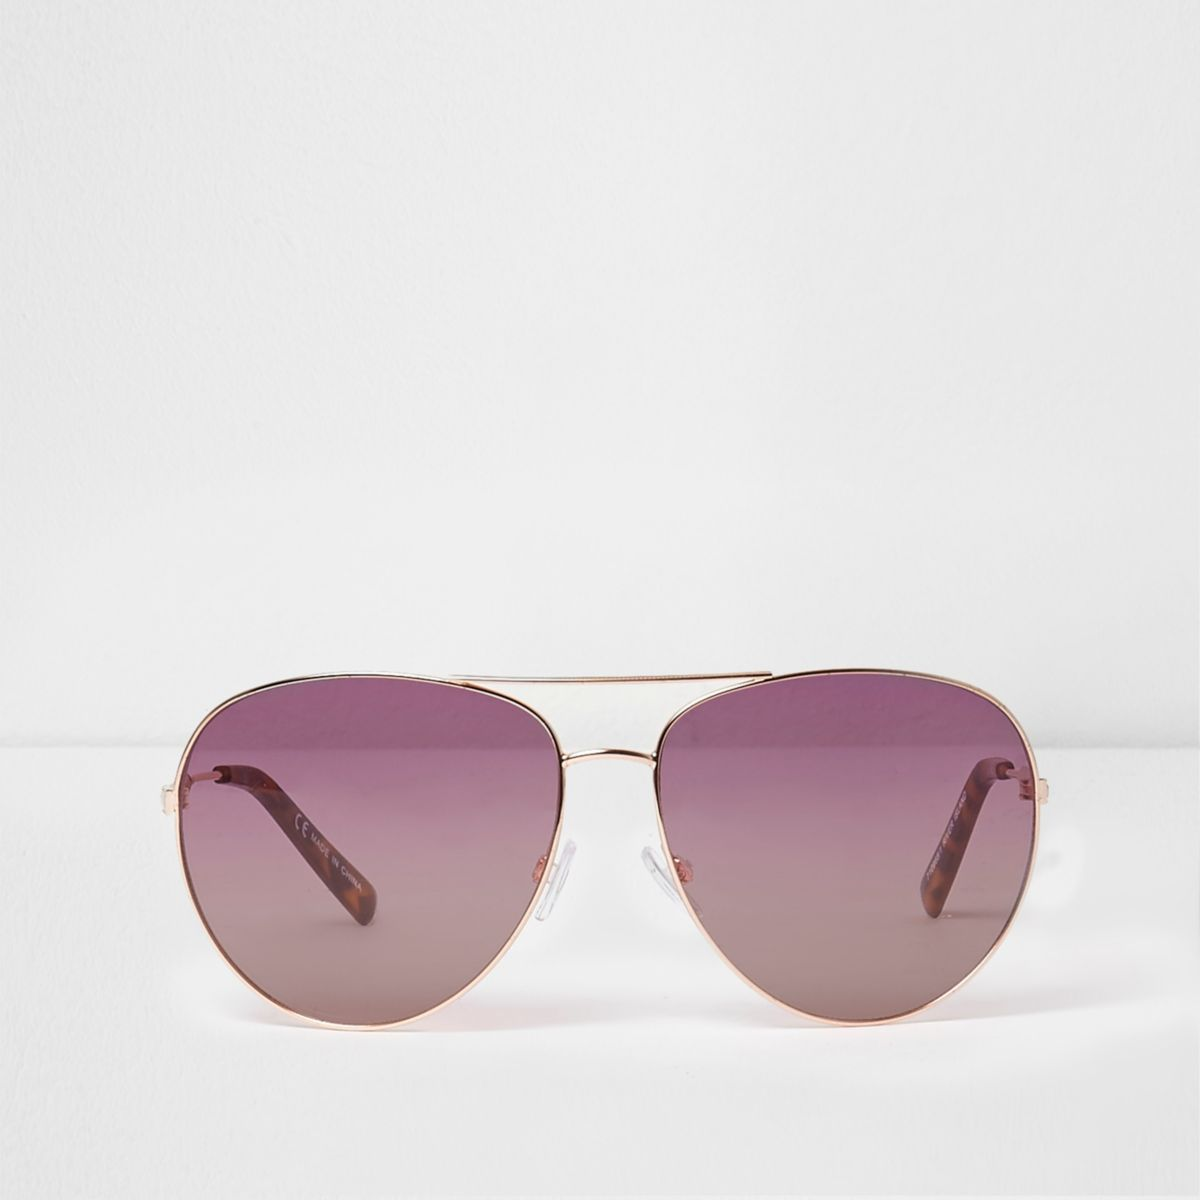 Rose gold tone pink lenses aviator sunglasses